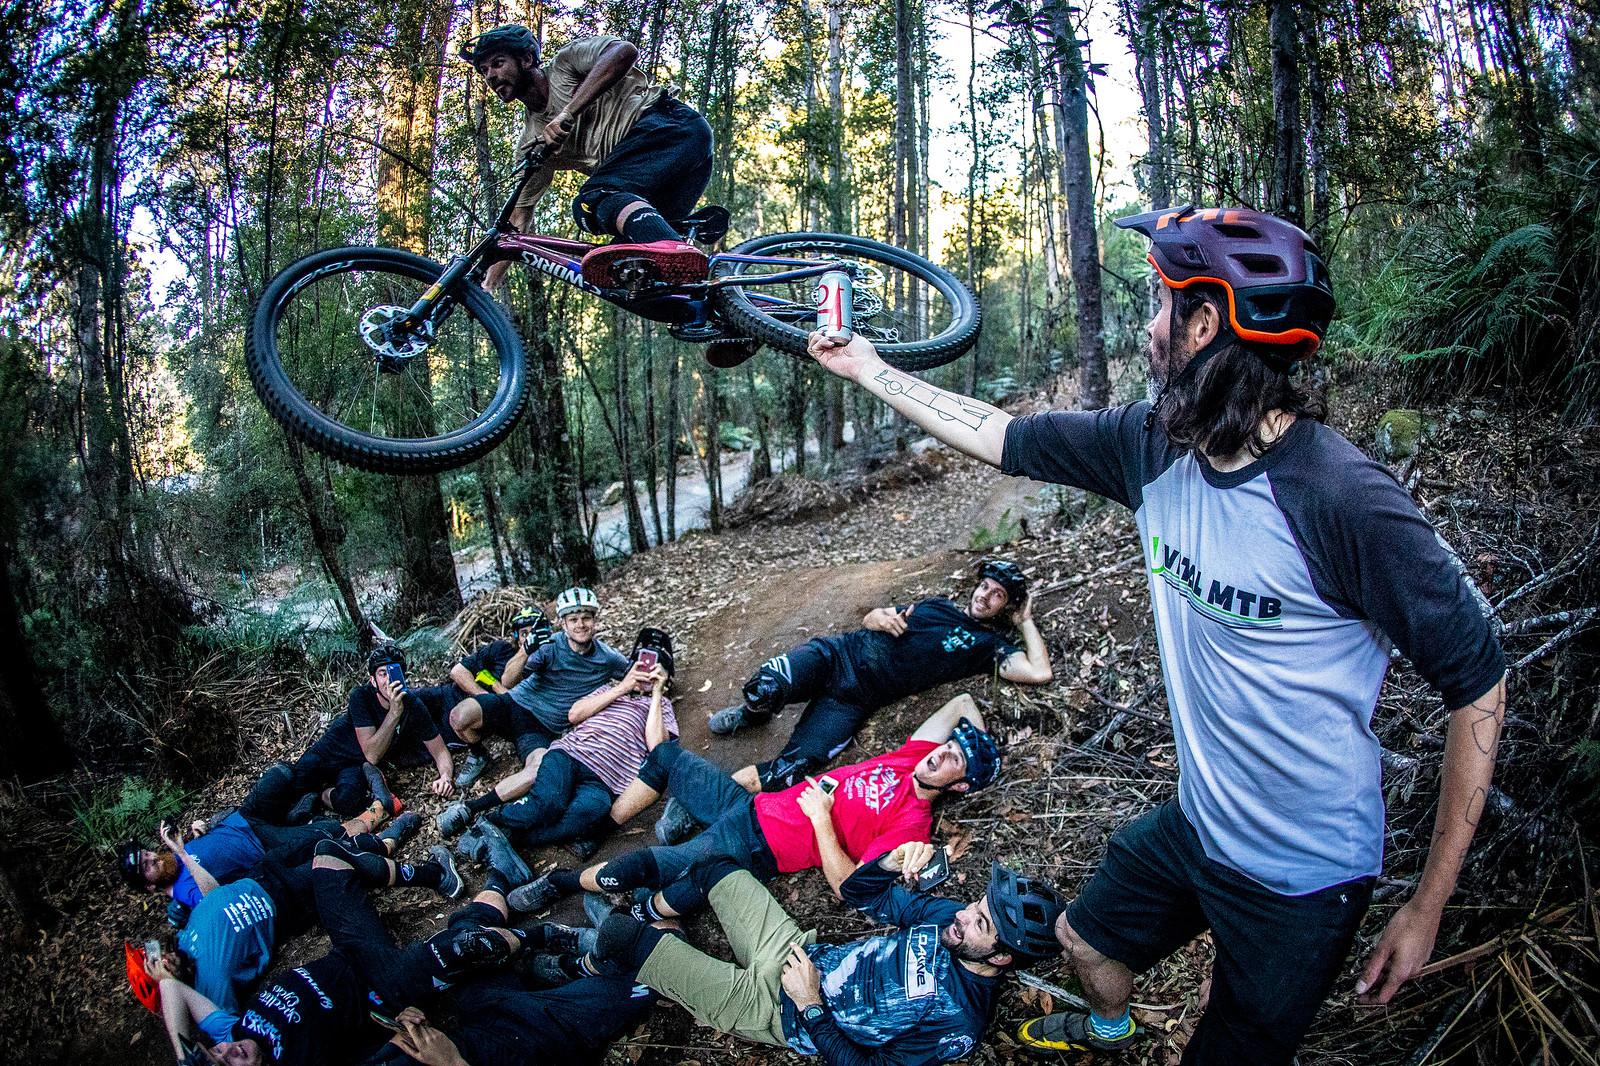 Officially Unsanctioned Enduro World Series Vertigo Bikes / Moo Beer / Vital Whip-Off - Officially Unsanctioned Enduro World Series Vertigo MTB / Moo Beer / Vital Whip-Off - Mountain Biking Pictures - Vital MTB